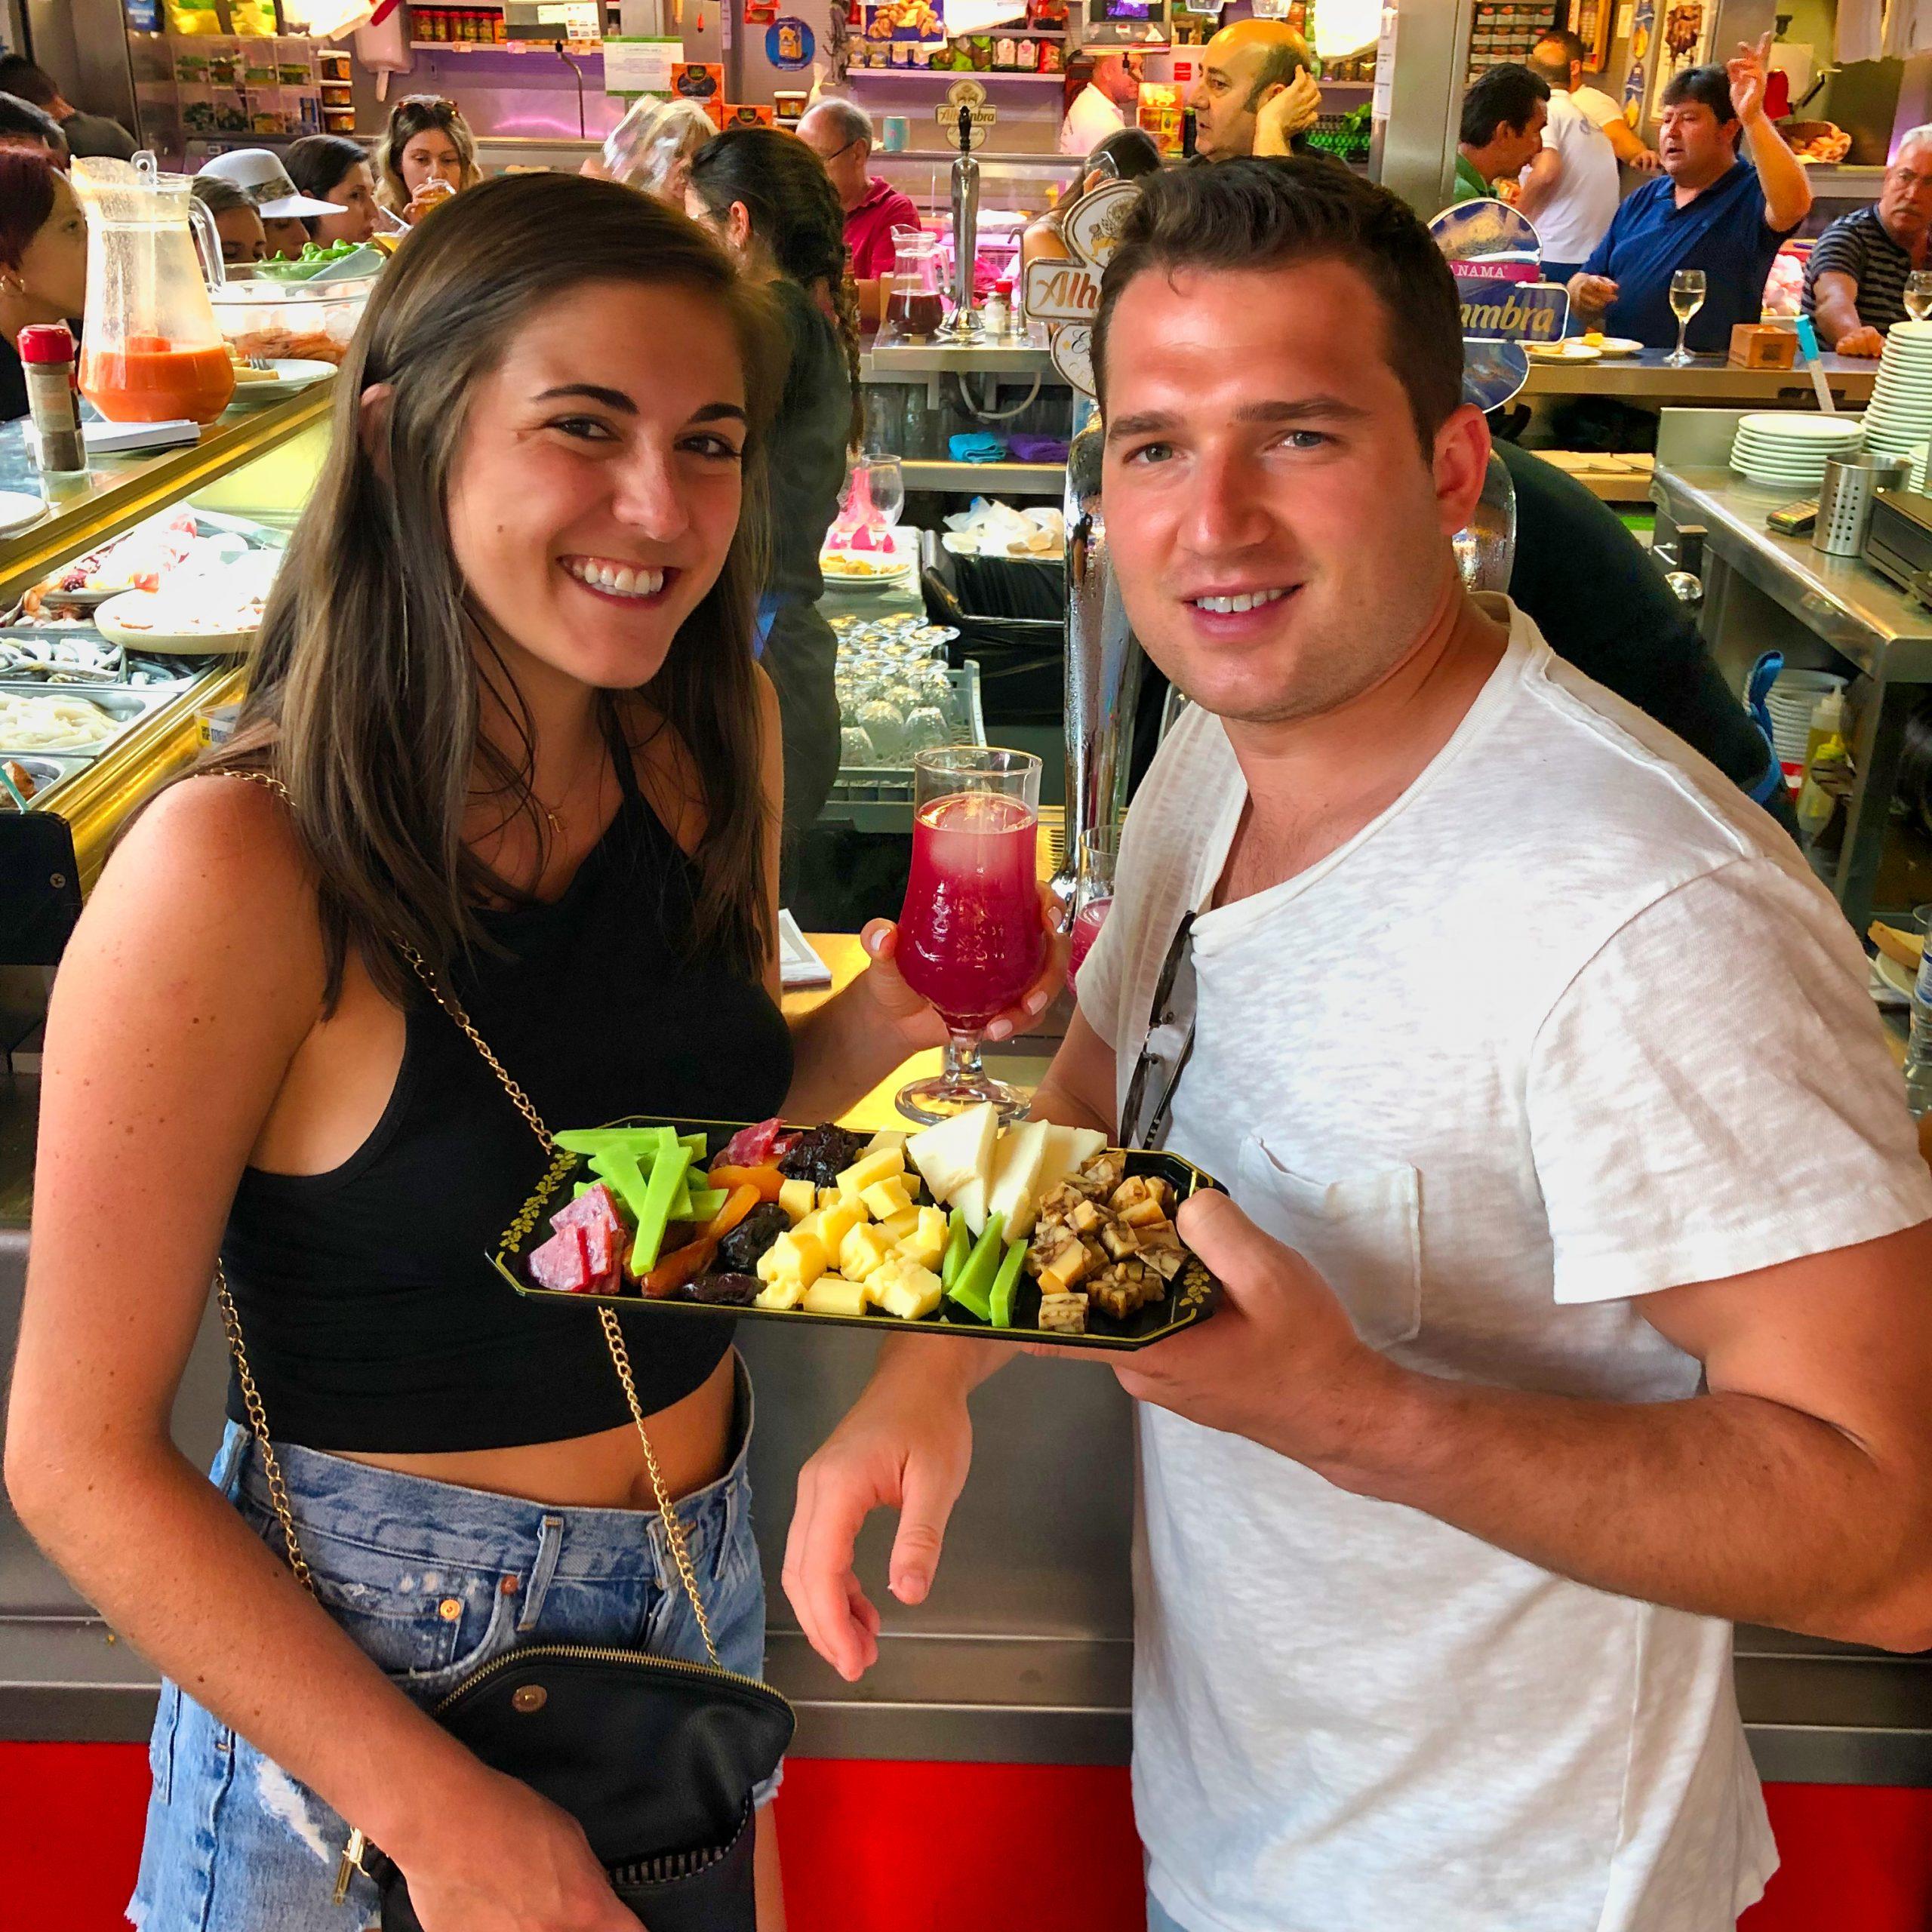 Happy travelers eating tapas